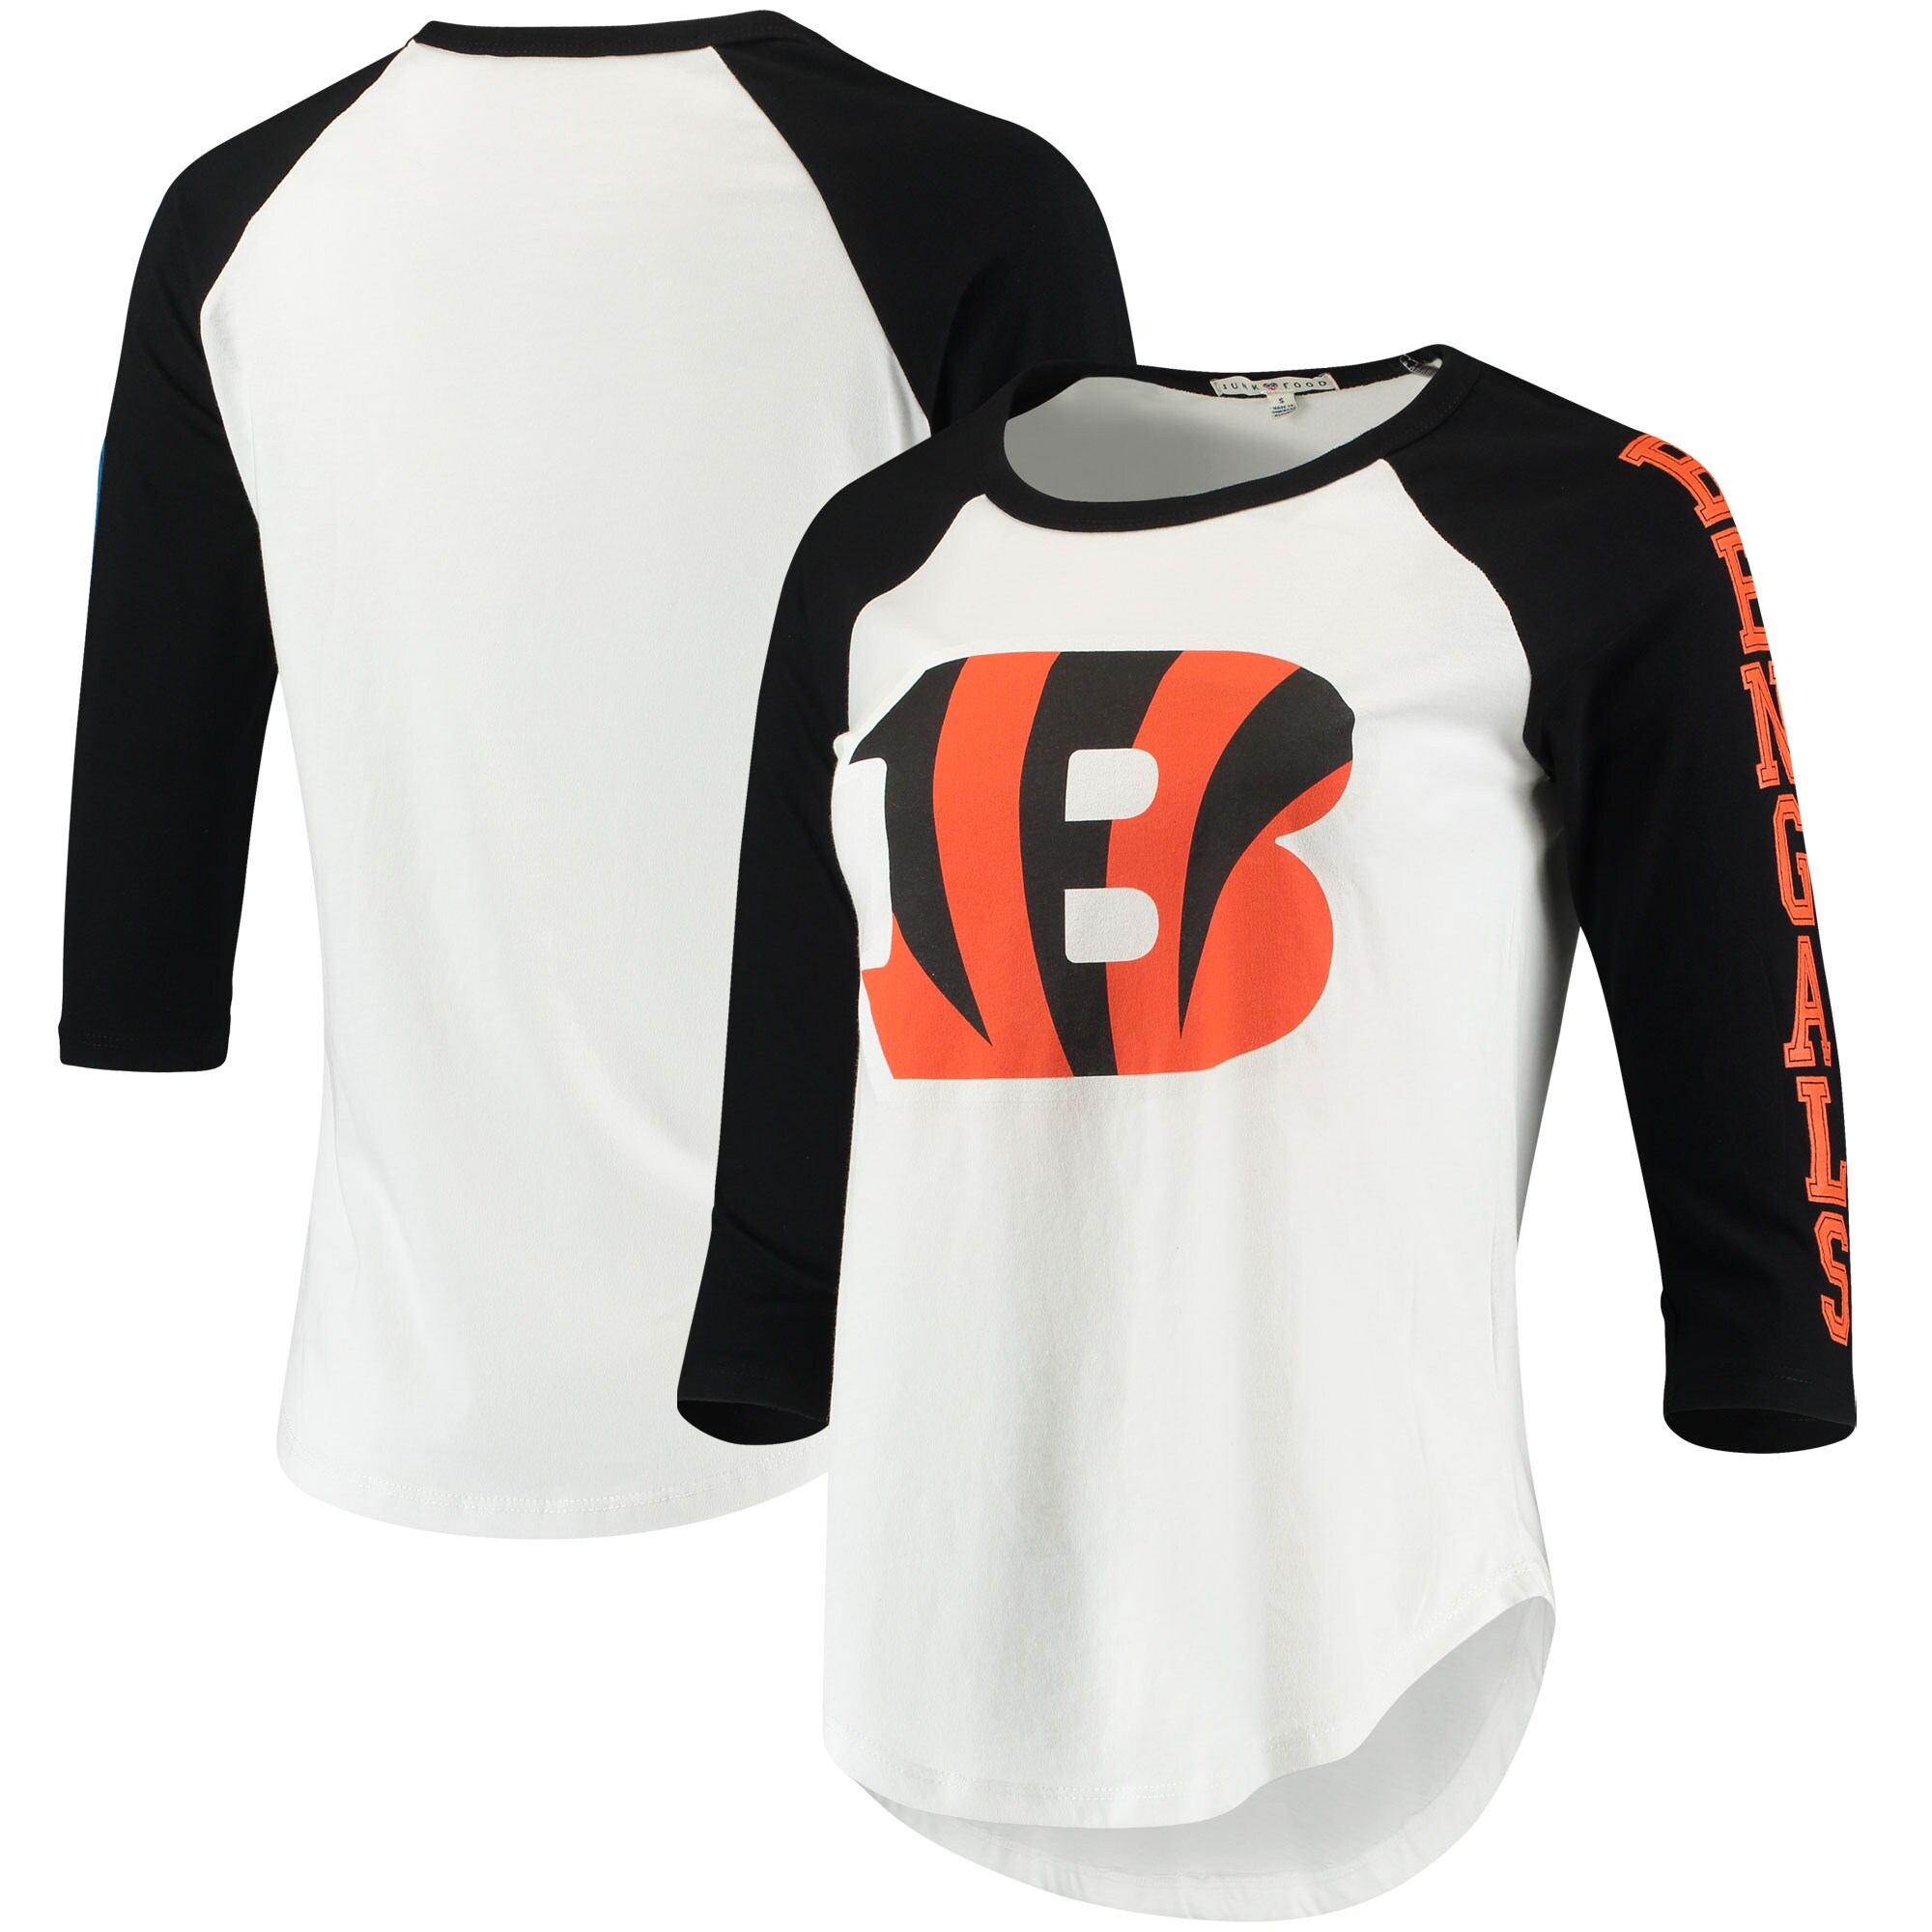 Cincinnati Bengals Junk Food Women's Vintage 3/4-Sleeve Raglan T-Shirt - White/Black